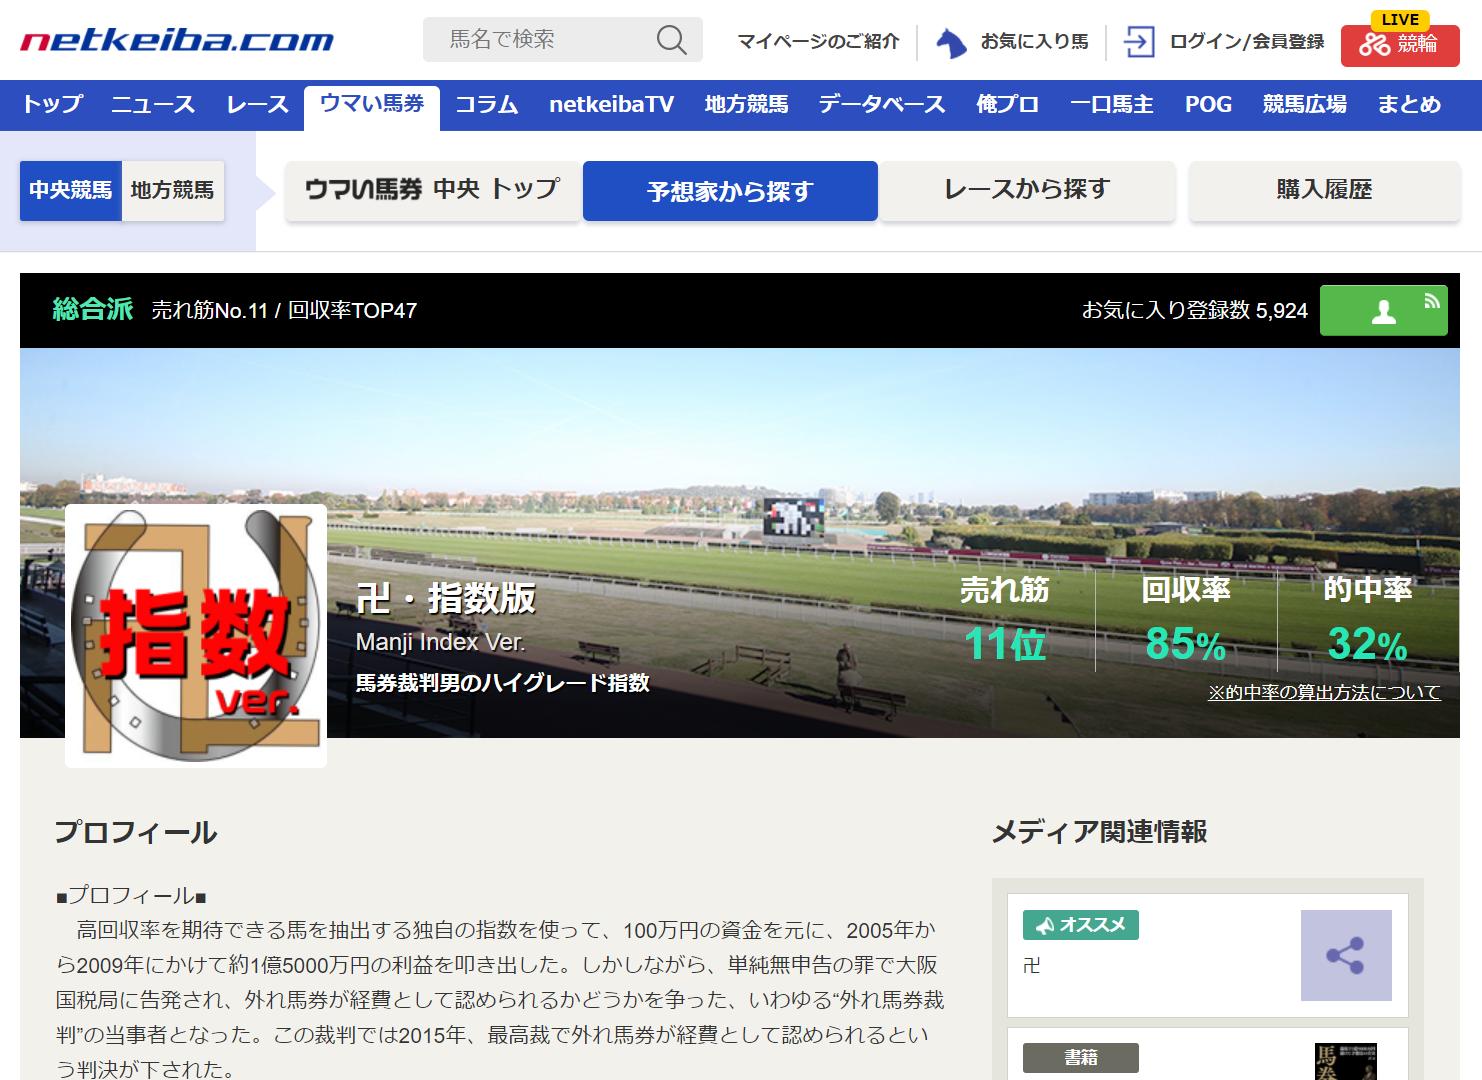 卍・指数版(netkeiba.com)の口コミ・評判・評価